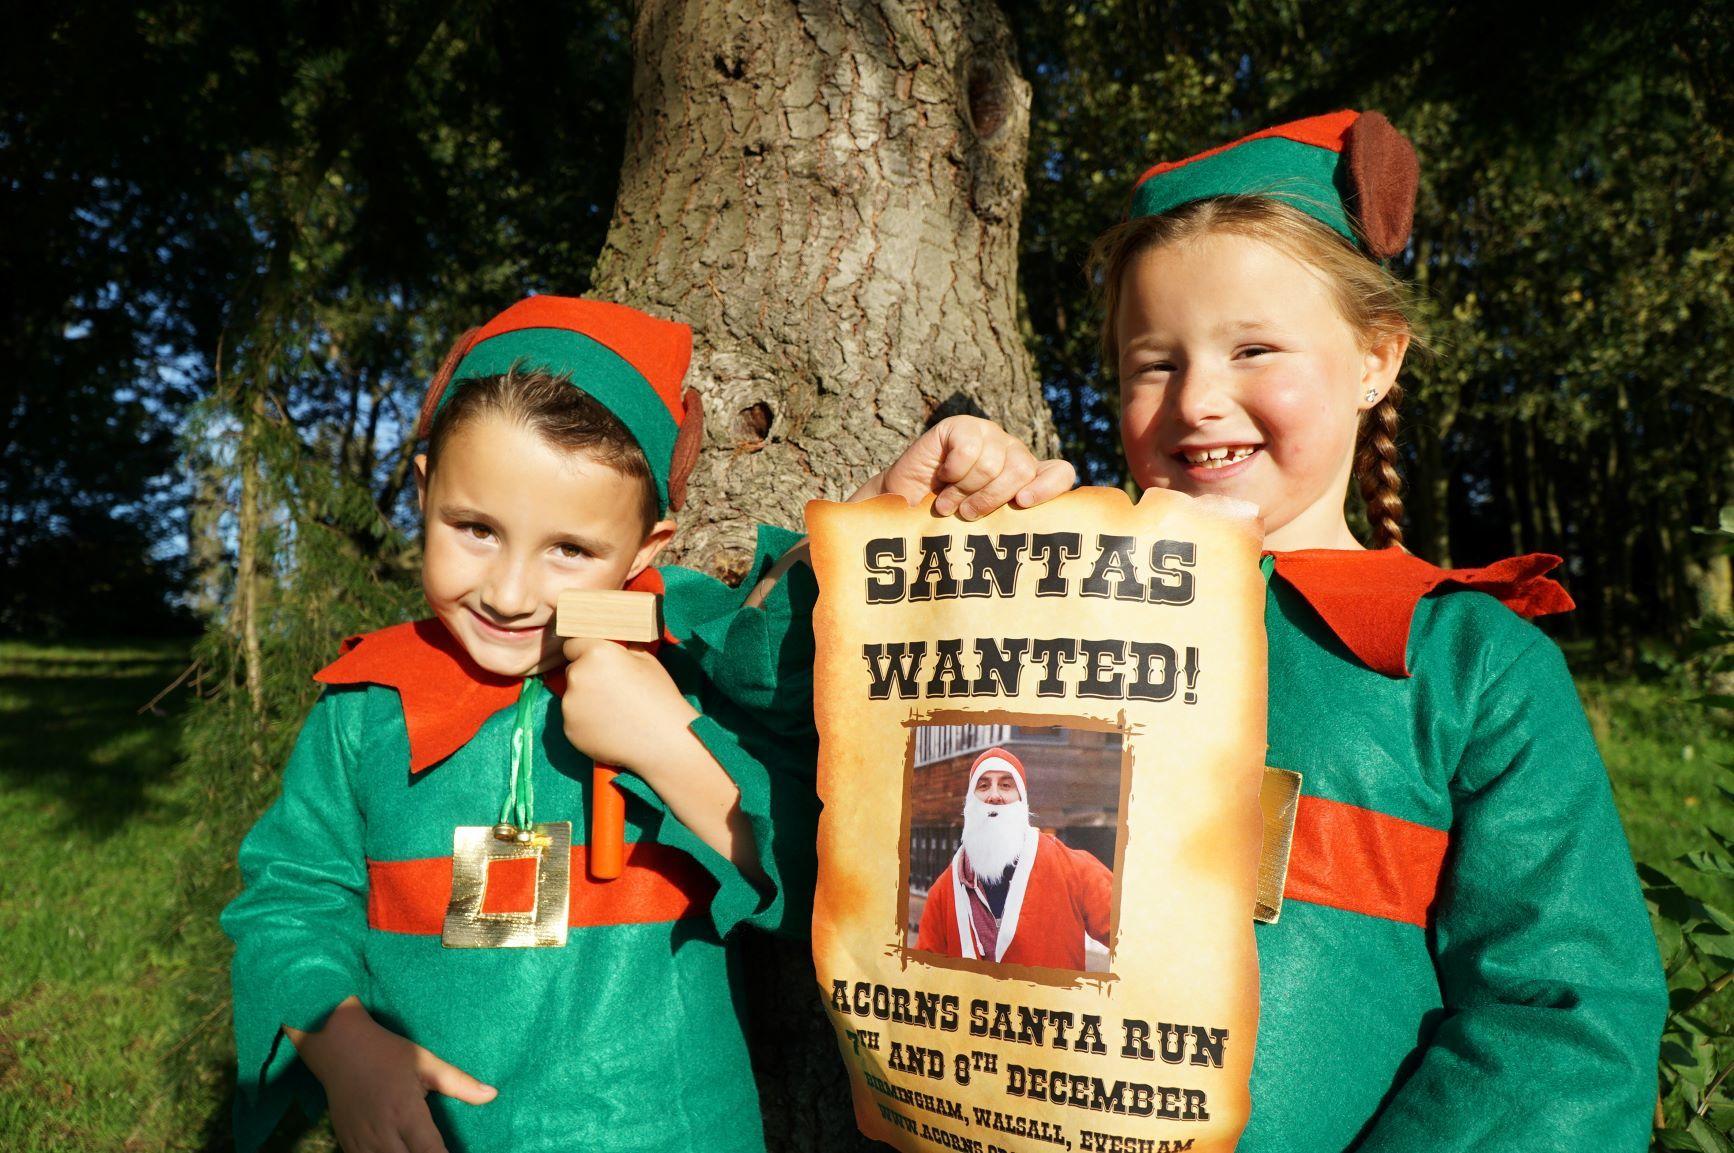 Acorns Santa Run in Evesham open for entries - Dudley News